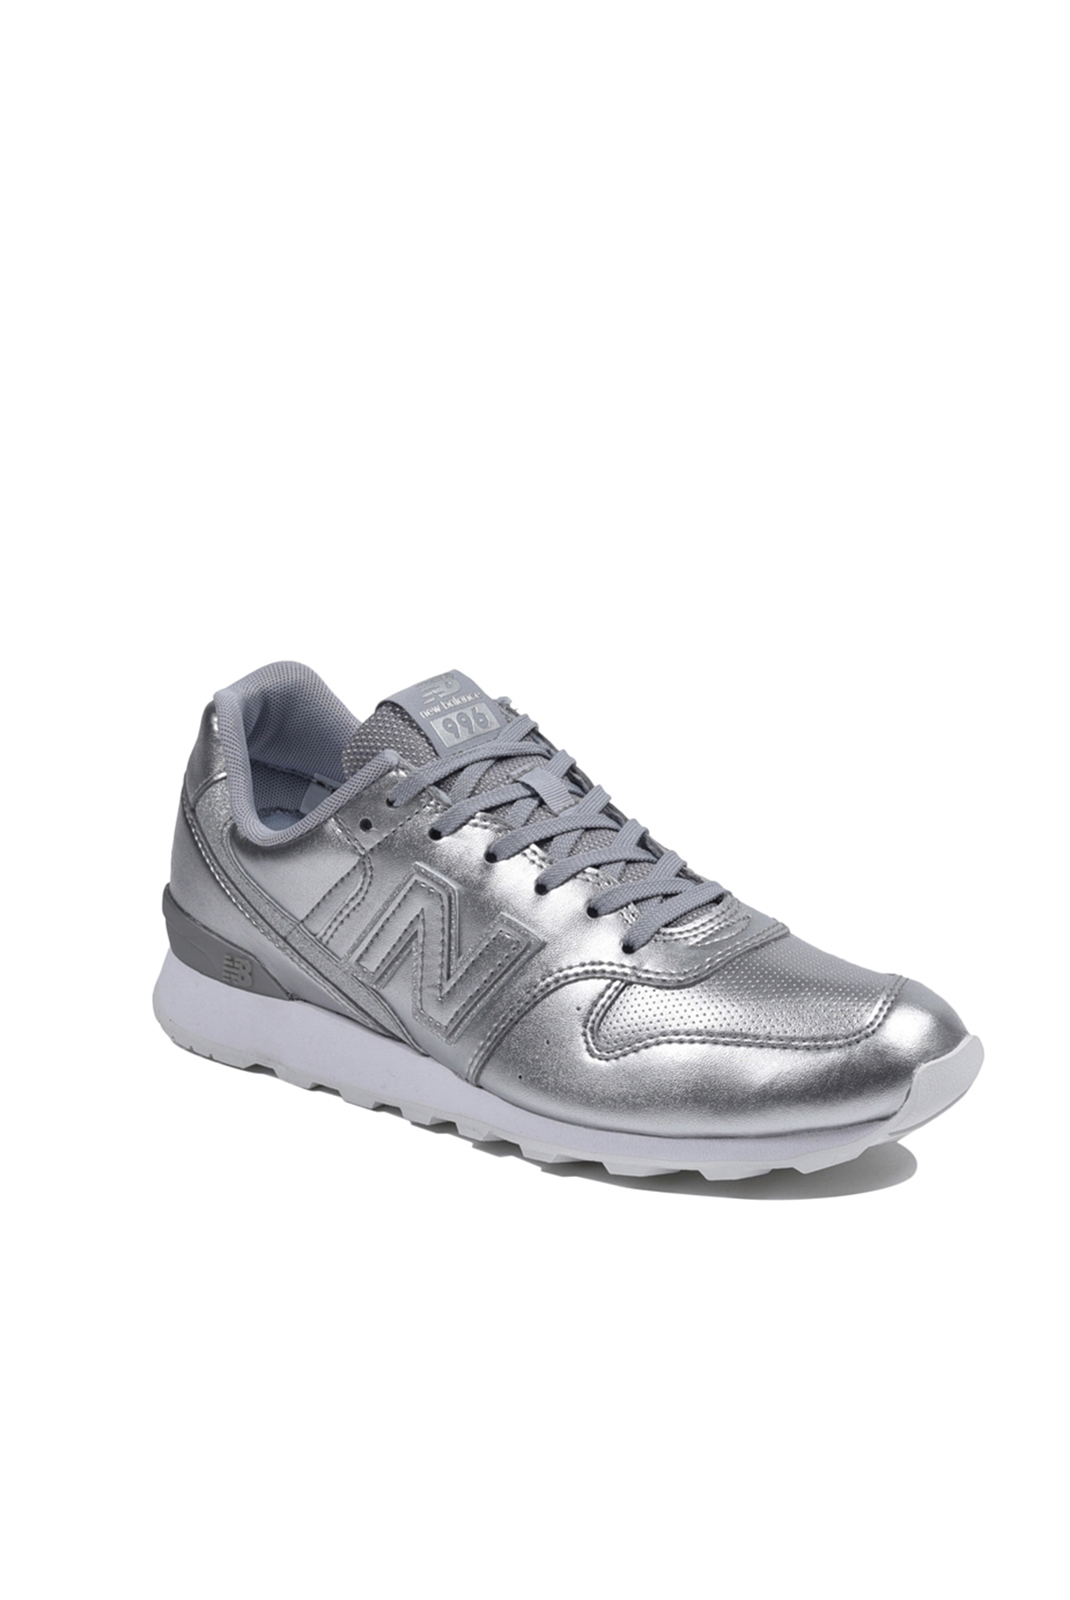 Chaussures   New balance WR996SRS ARGENT